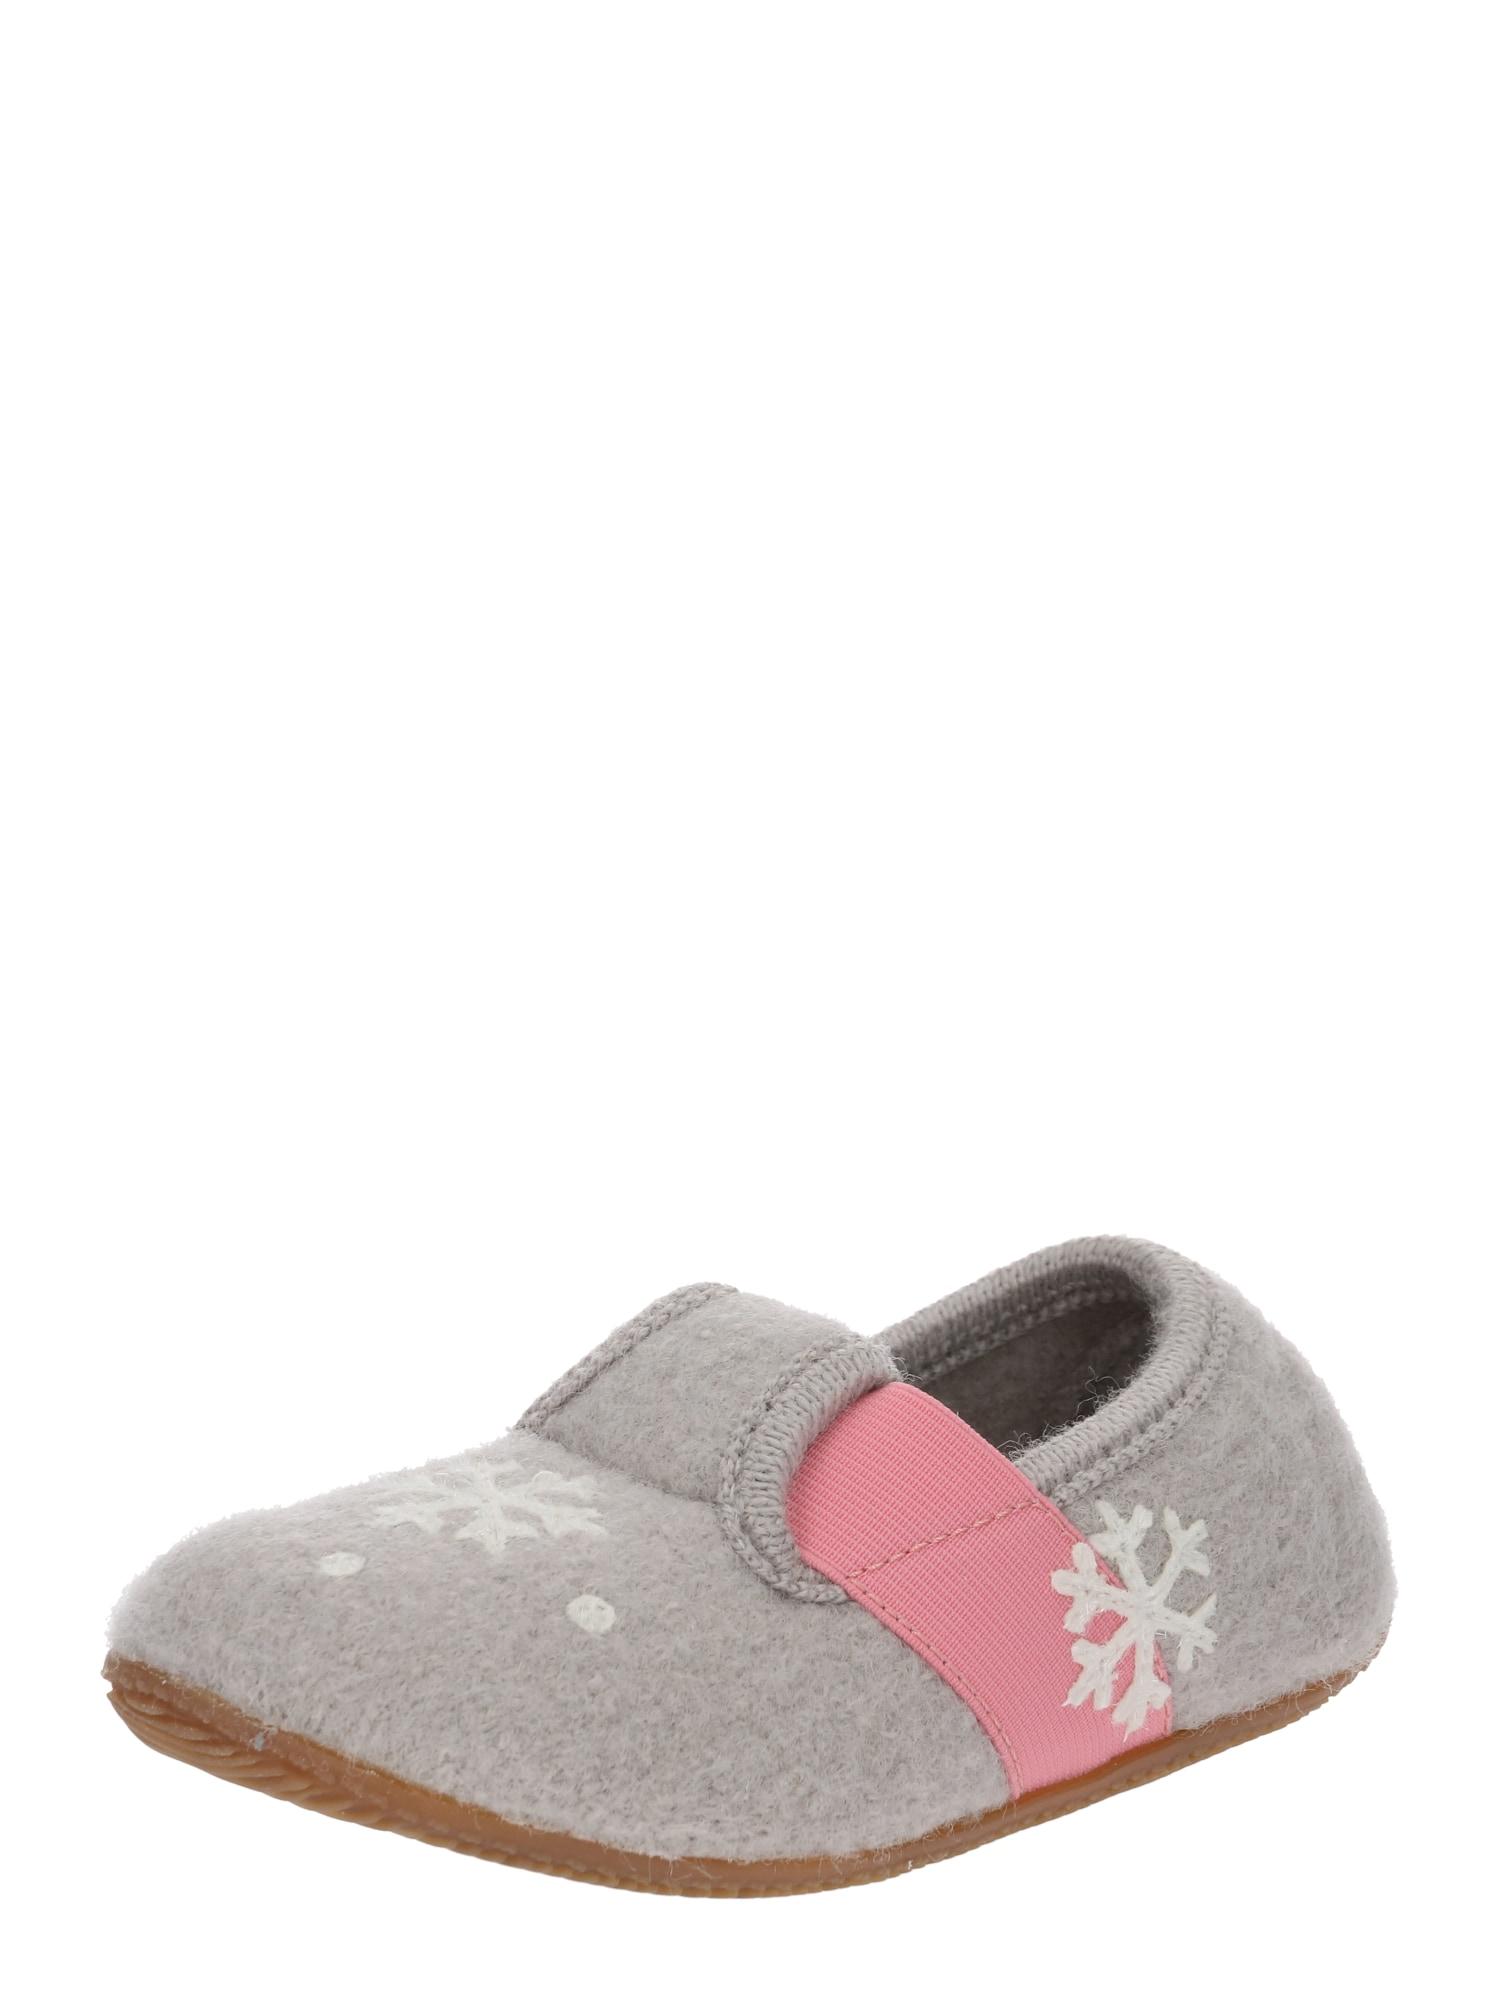 Pantofle 3623-619 béžová růžová Living Kitzbühel